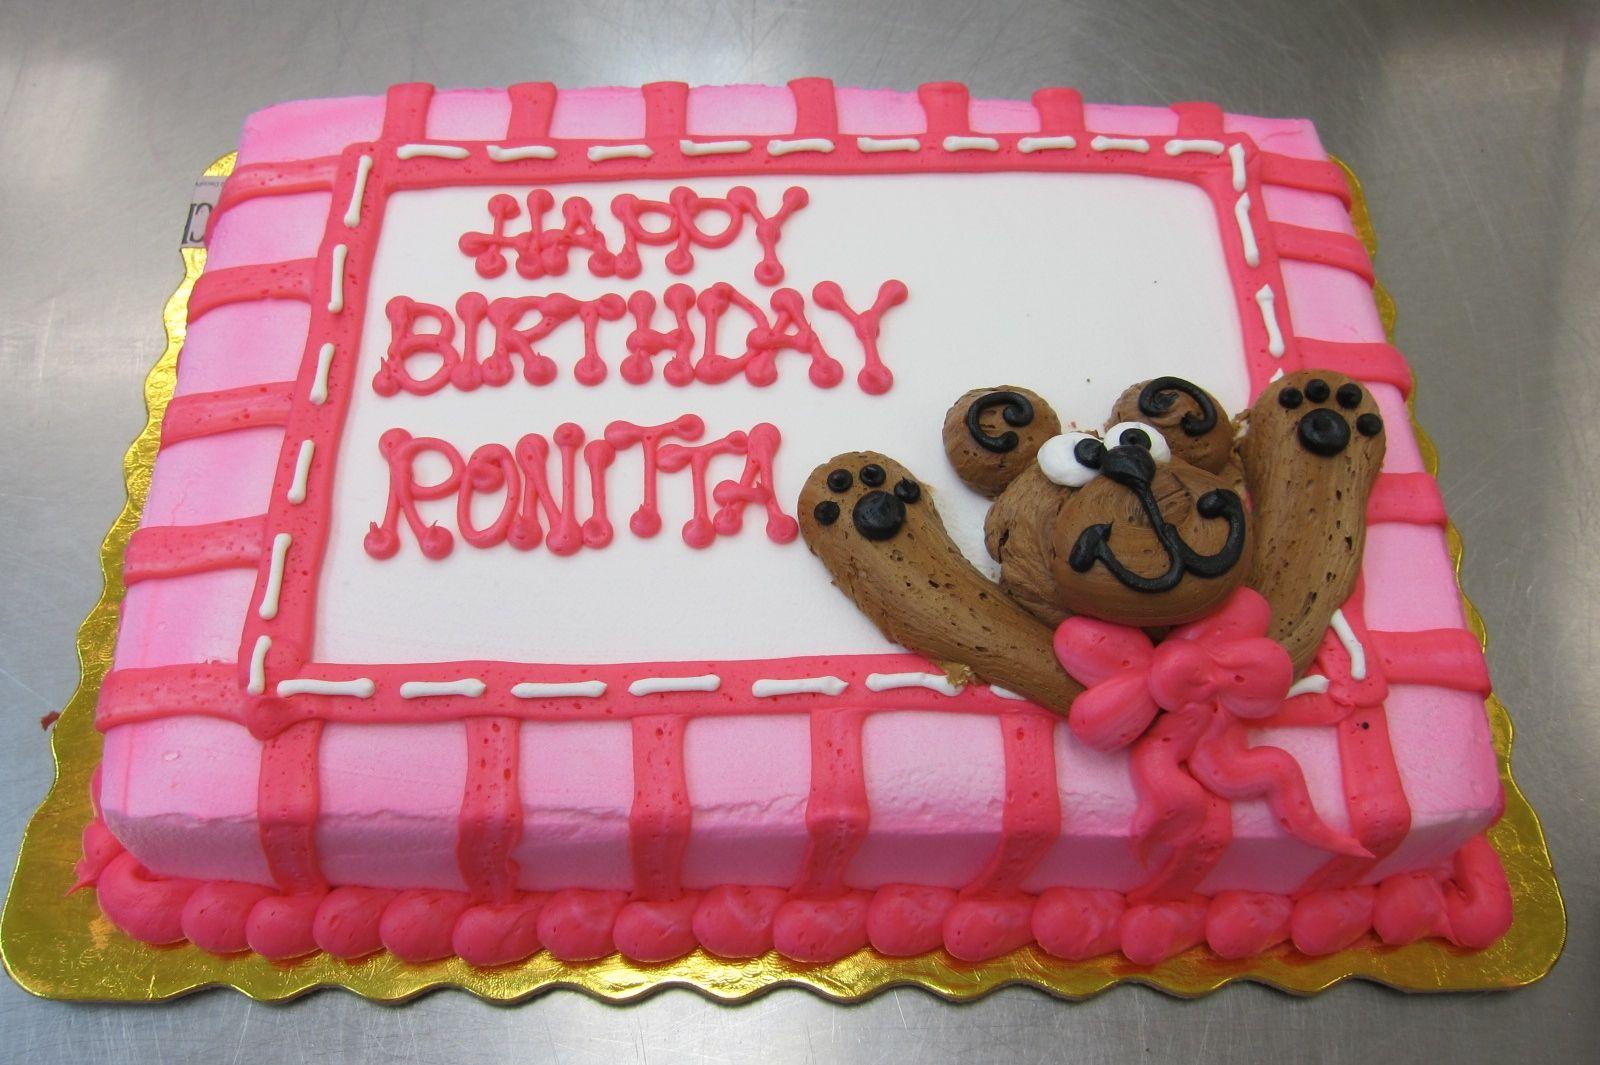 Cute Pink Beat Cake by Stephanie Dillon LS1 HyVee Bakery